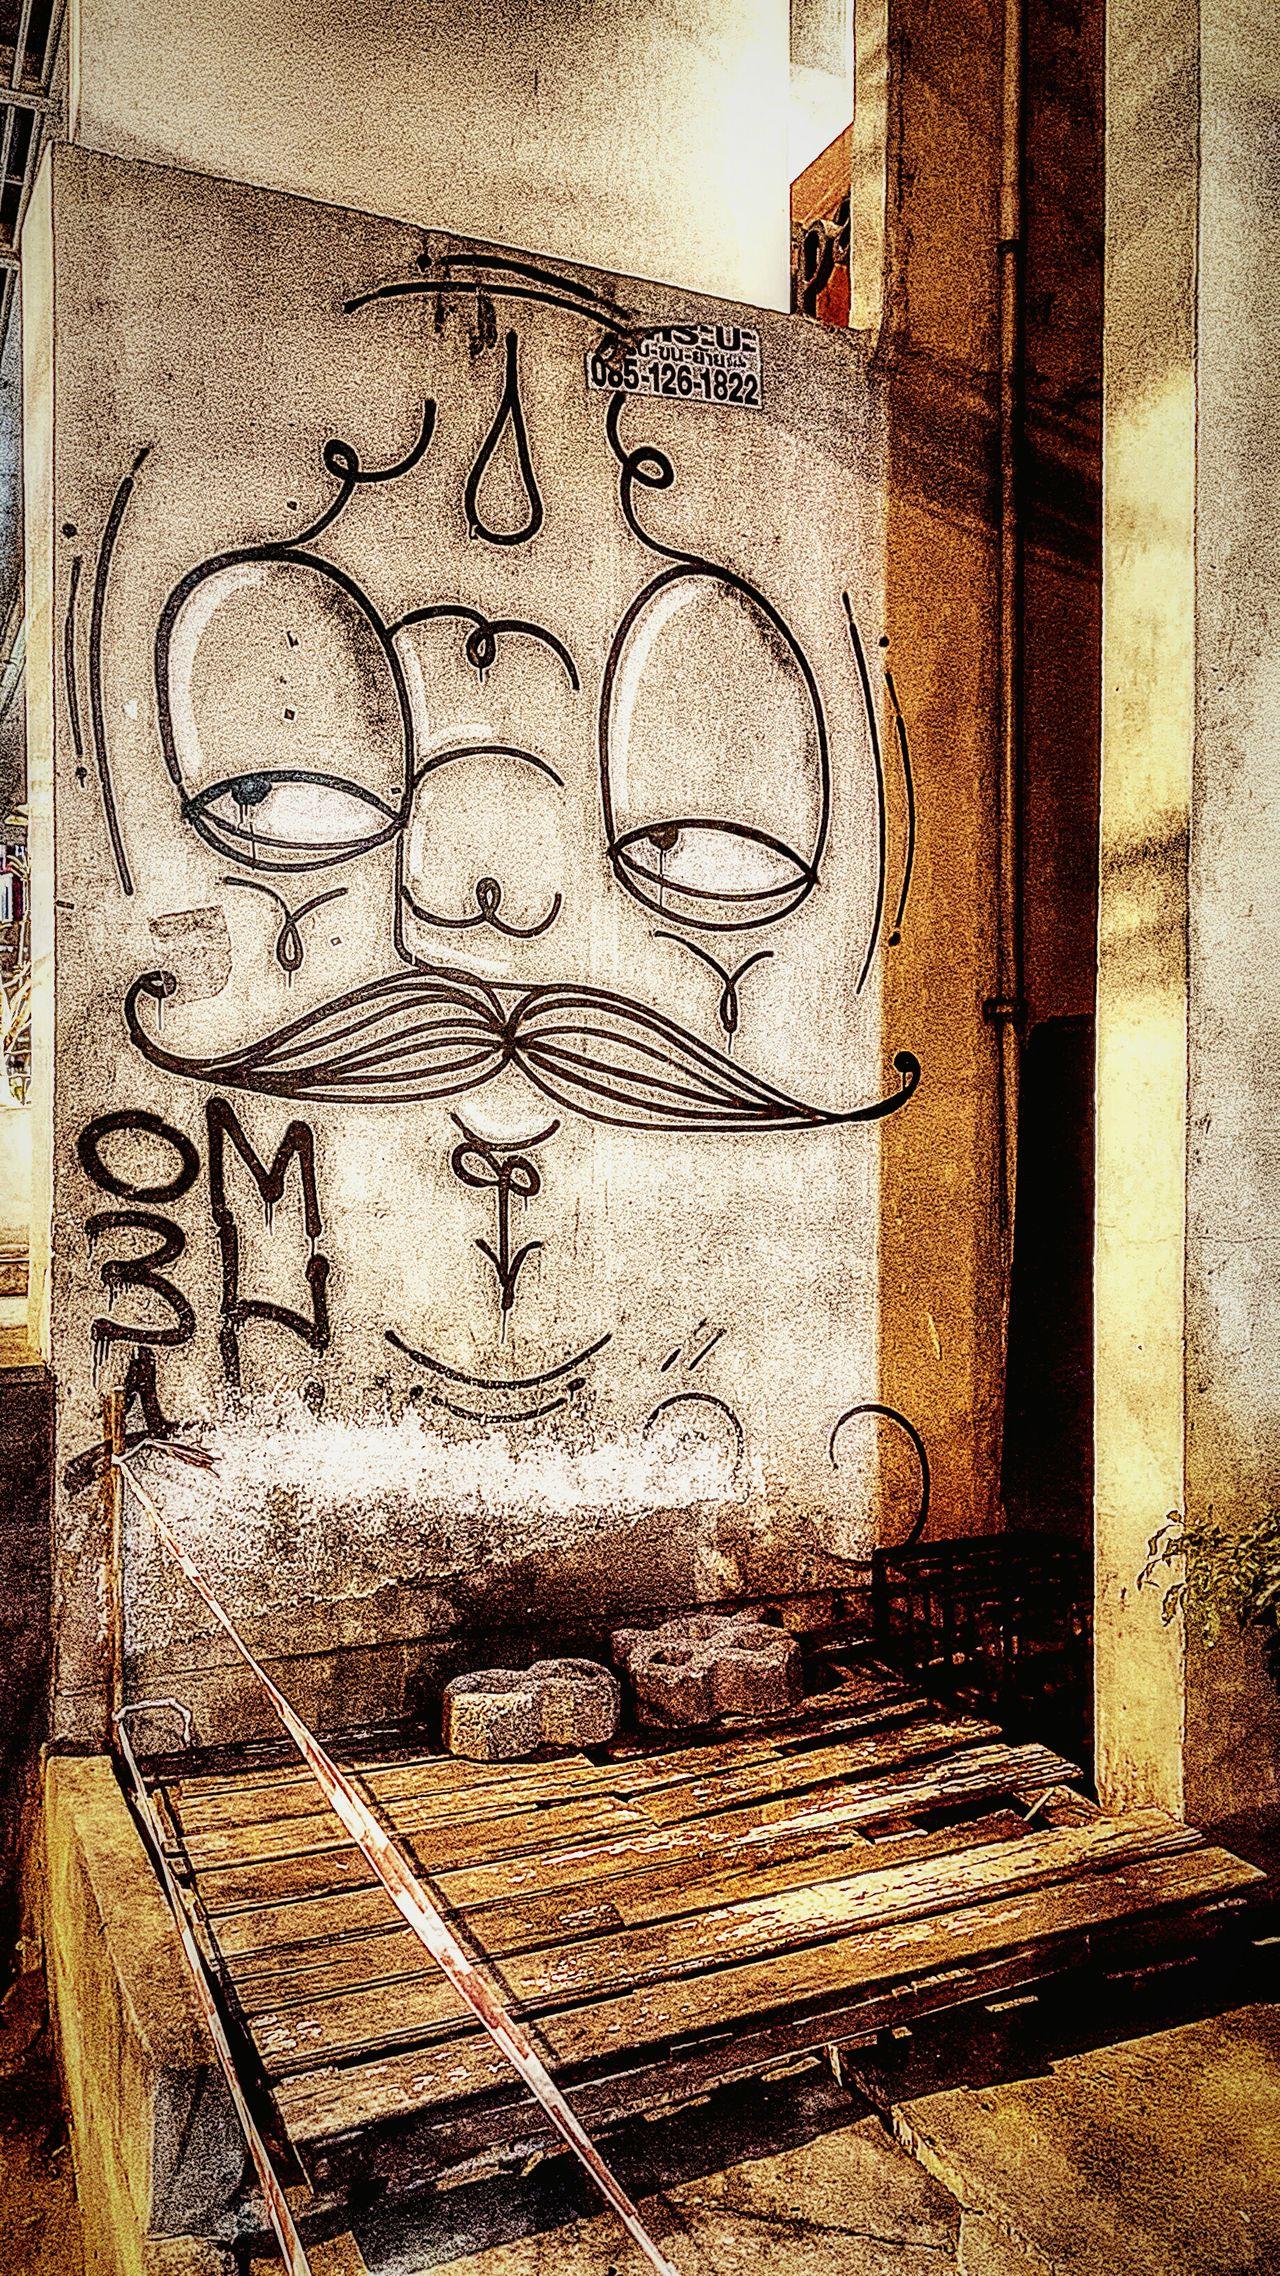 Street art Streetart Street Photography Graffiti Art Wall Art Wallpainting Thailand Street Street In Thai Street In City Bangkok Thailand Bangkok My Capture  Travel Photography Wanderlust The Week Of Eyeem Travelgram Land Of Smiles Mustache Face Of Eyem Street Art/Graffiti The Shop Around The Corner